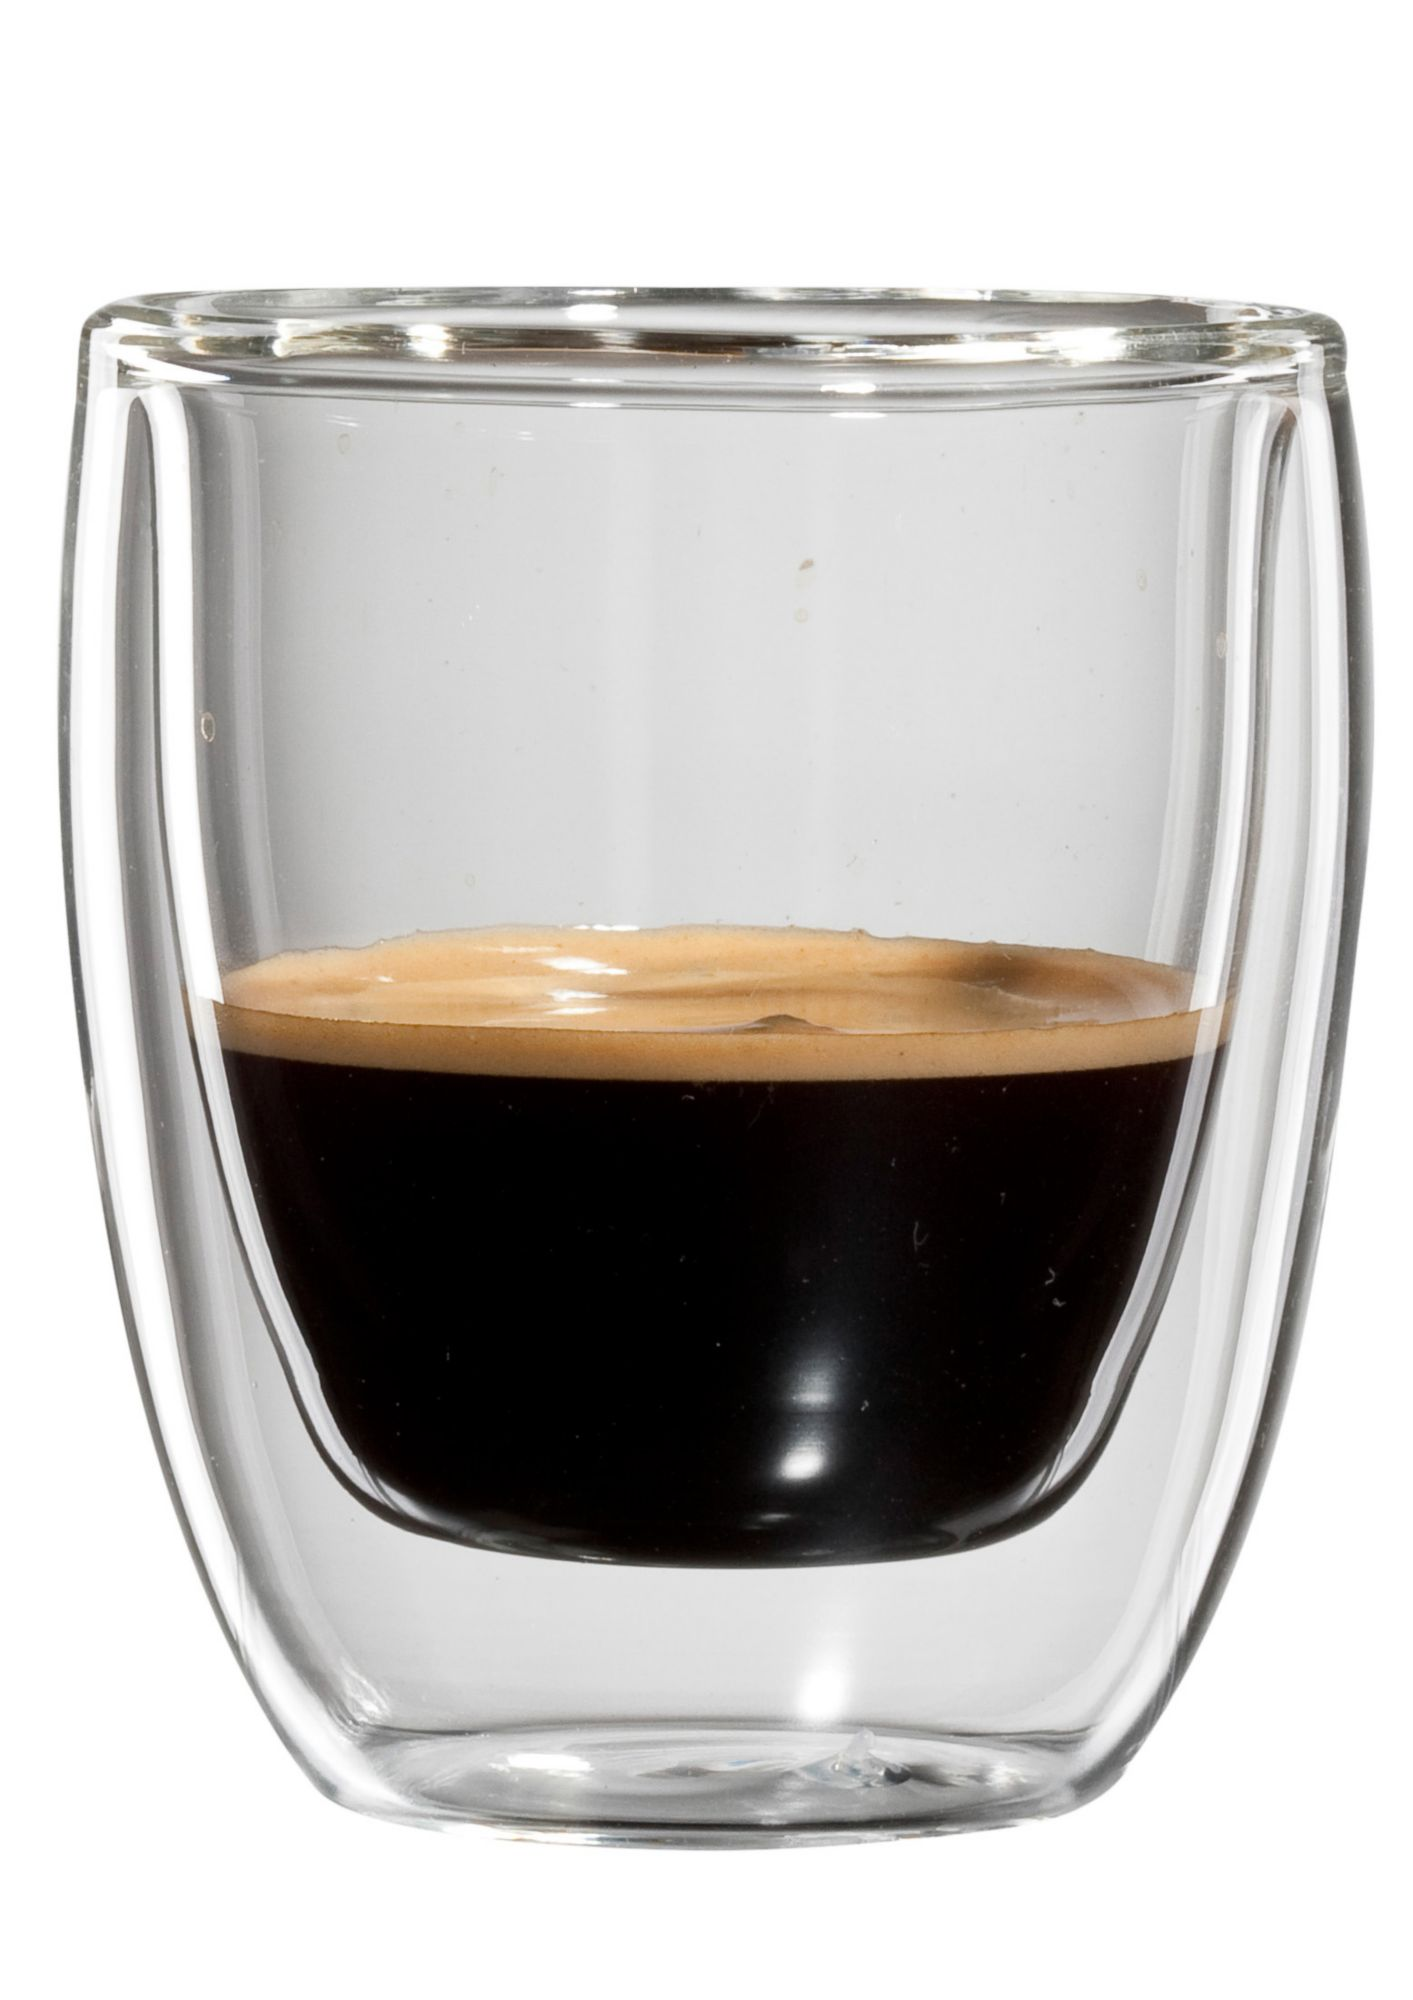 BLOOMIX bloomix Espresso-Glas, 4er Set, doppelwandig, »Roma«, 80 ml